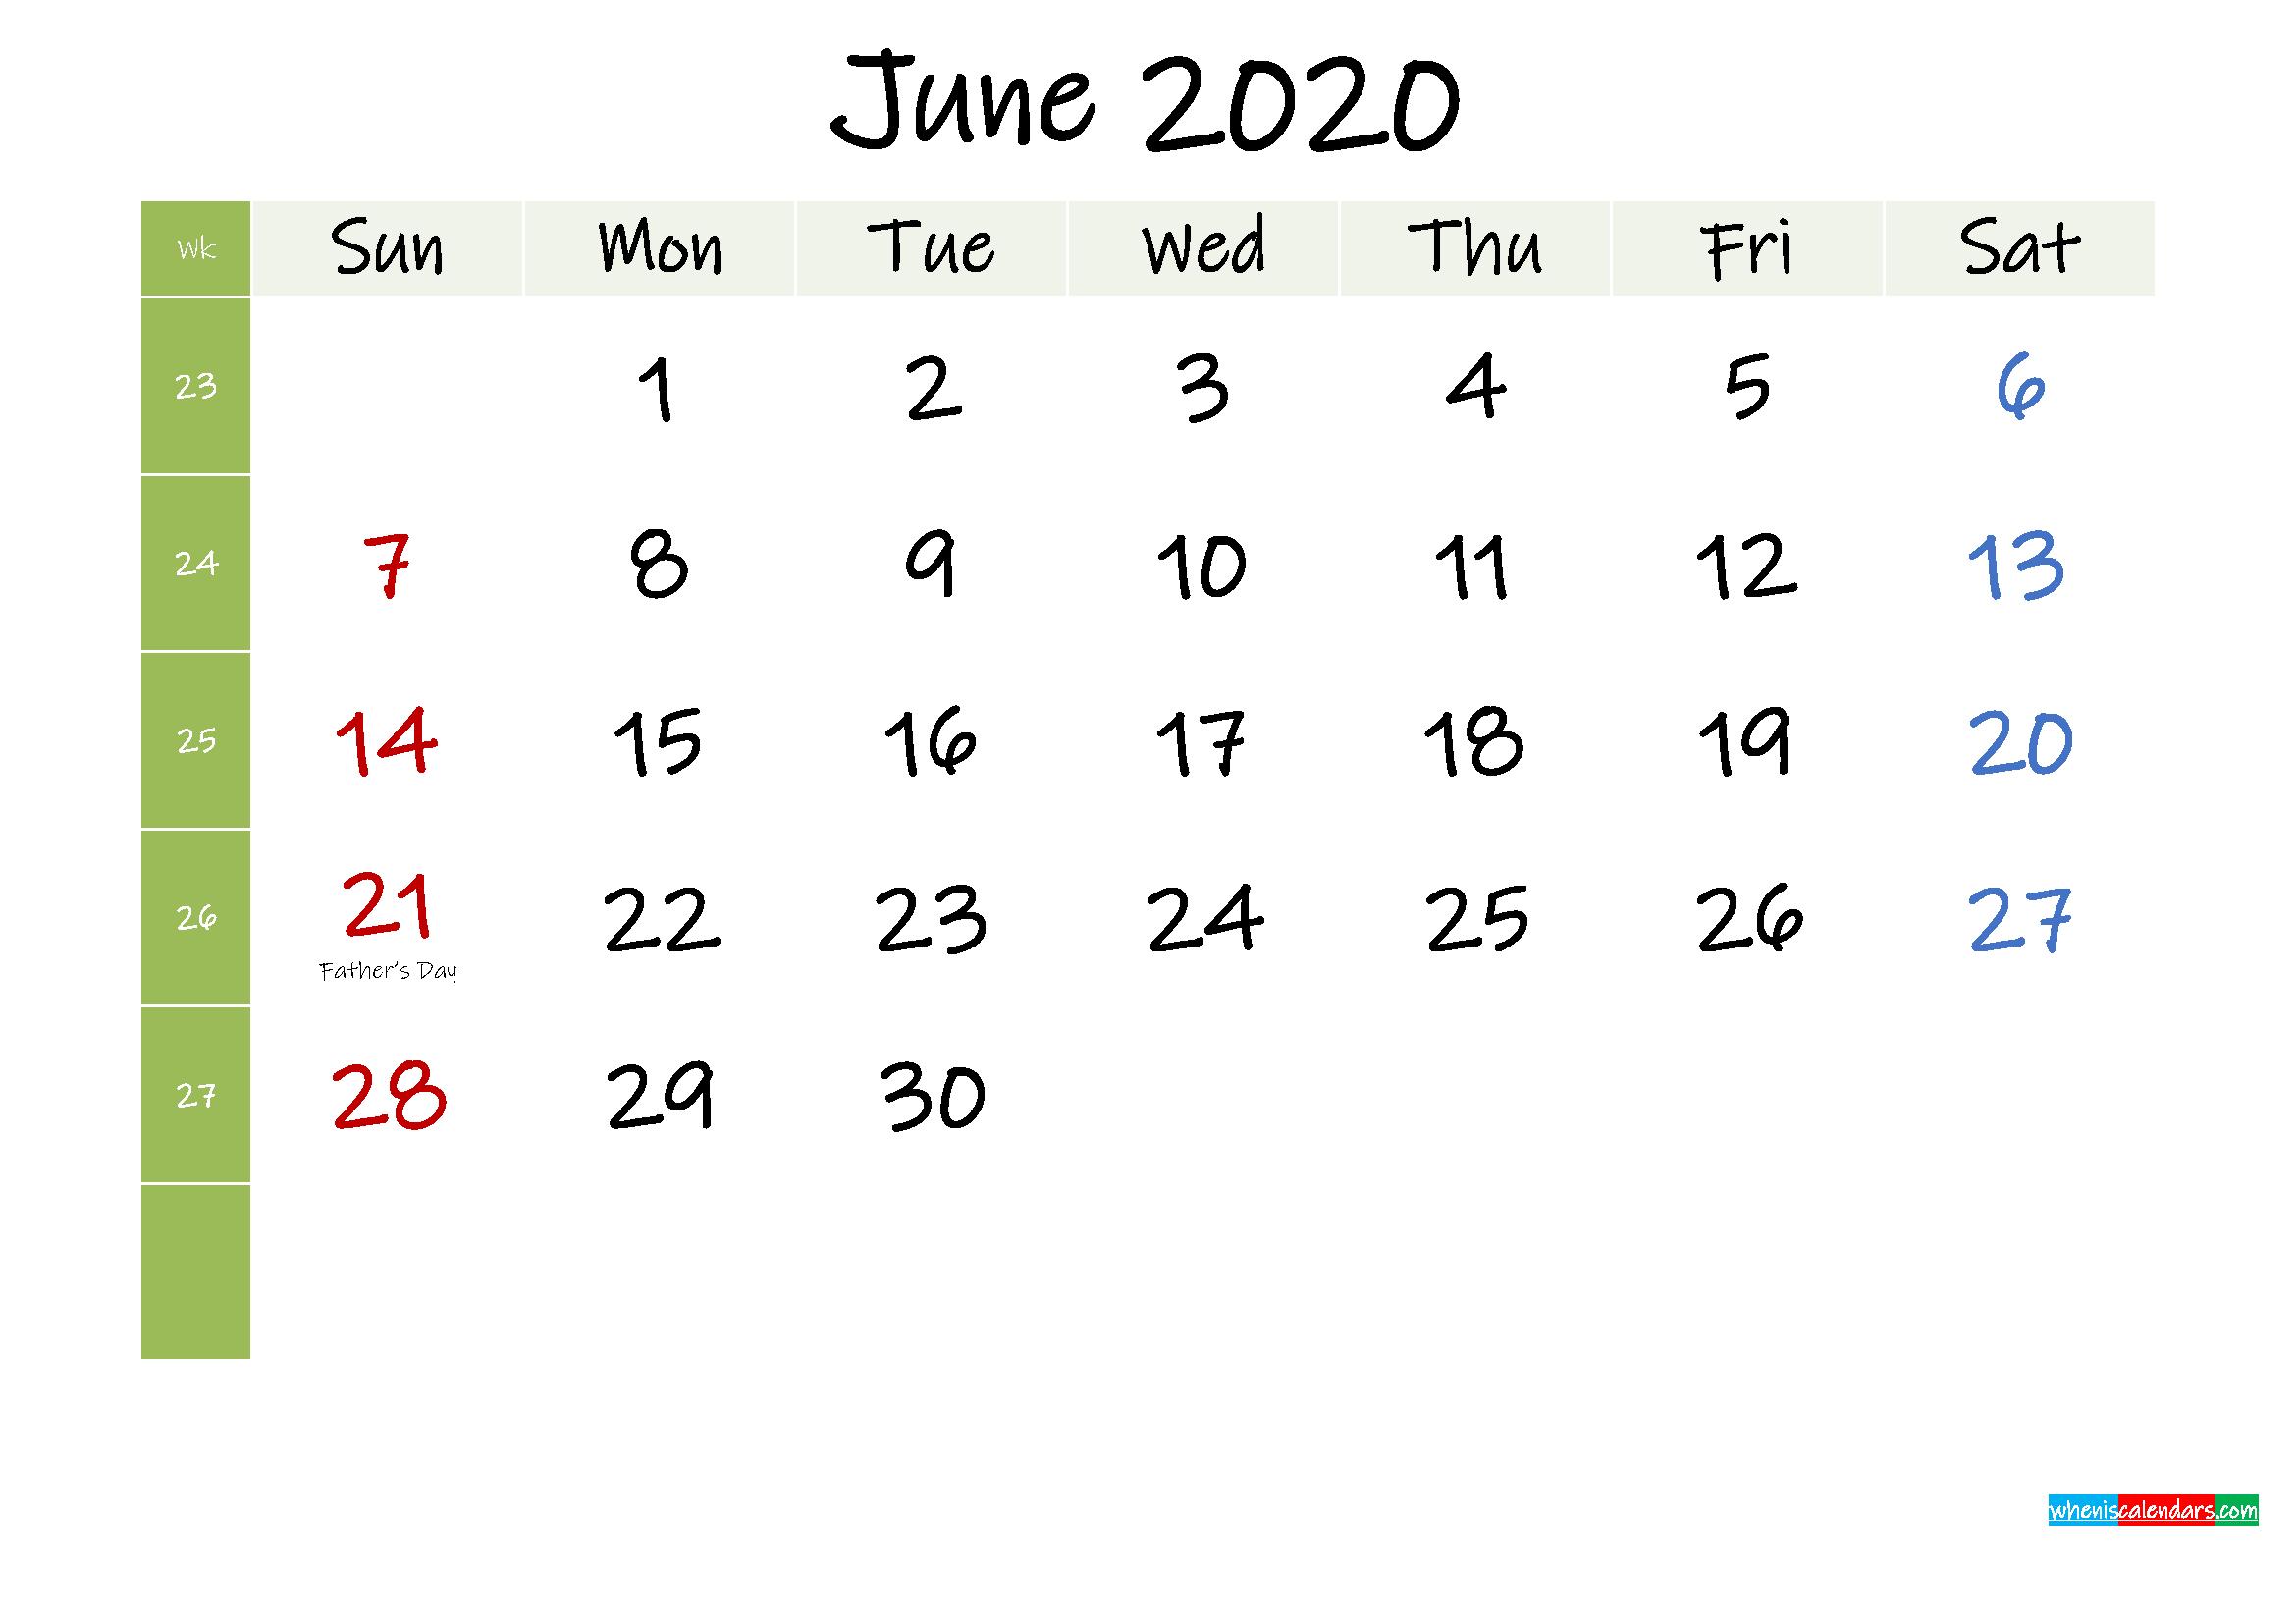 Free June 2020 Printable Calendar with Holidays